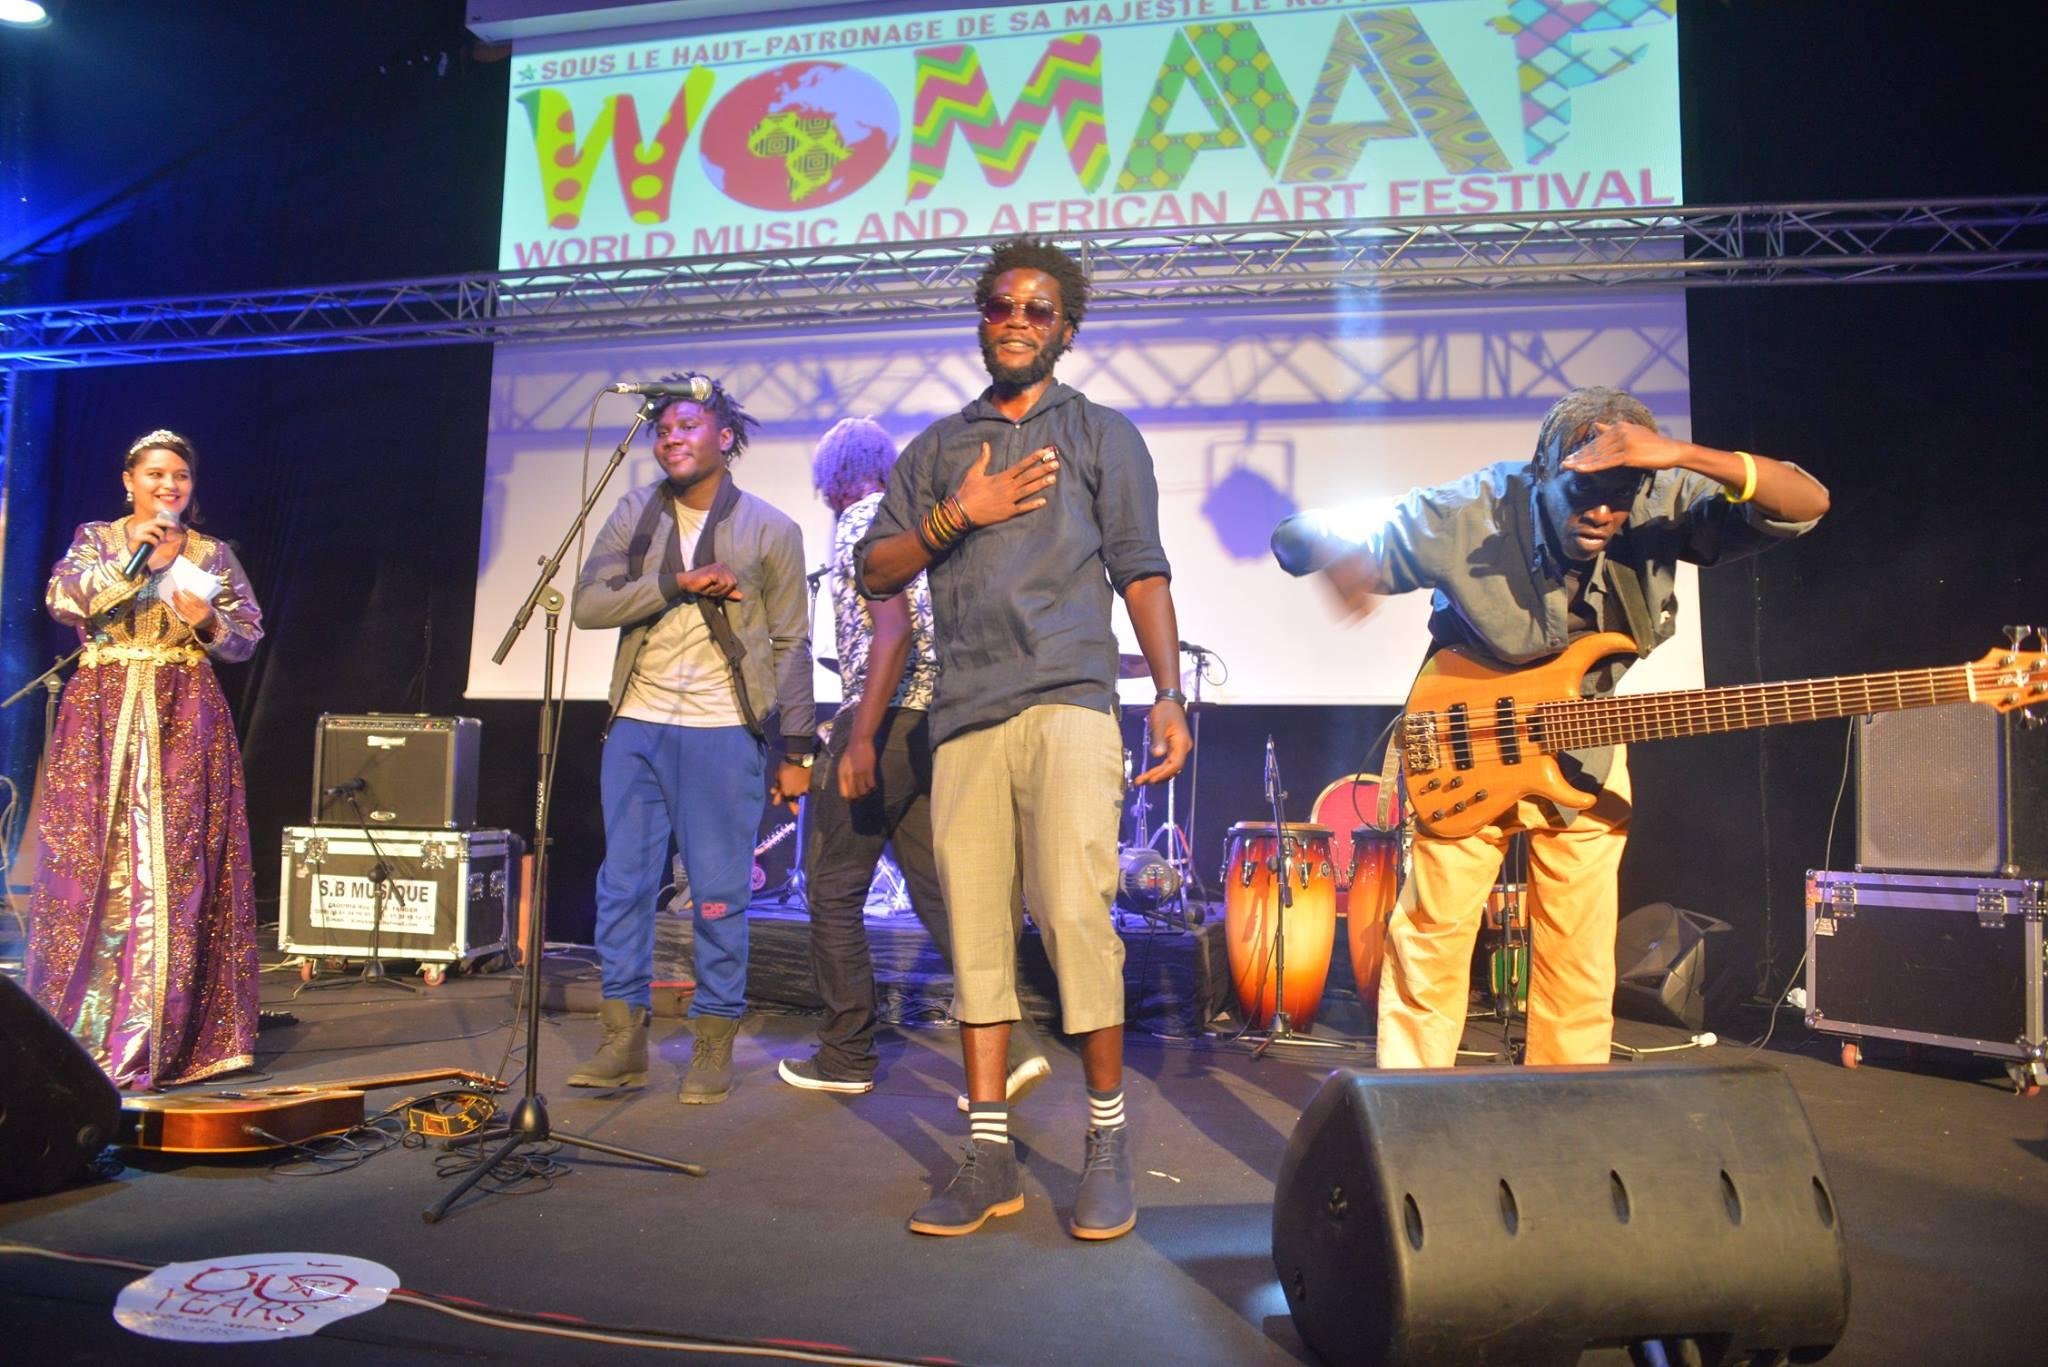 Festival WOMAAF